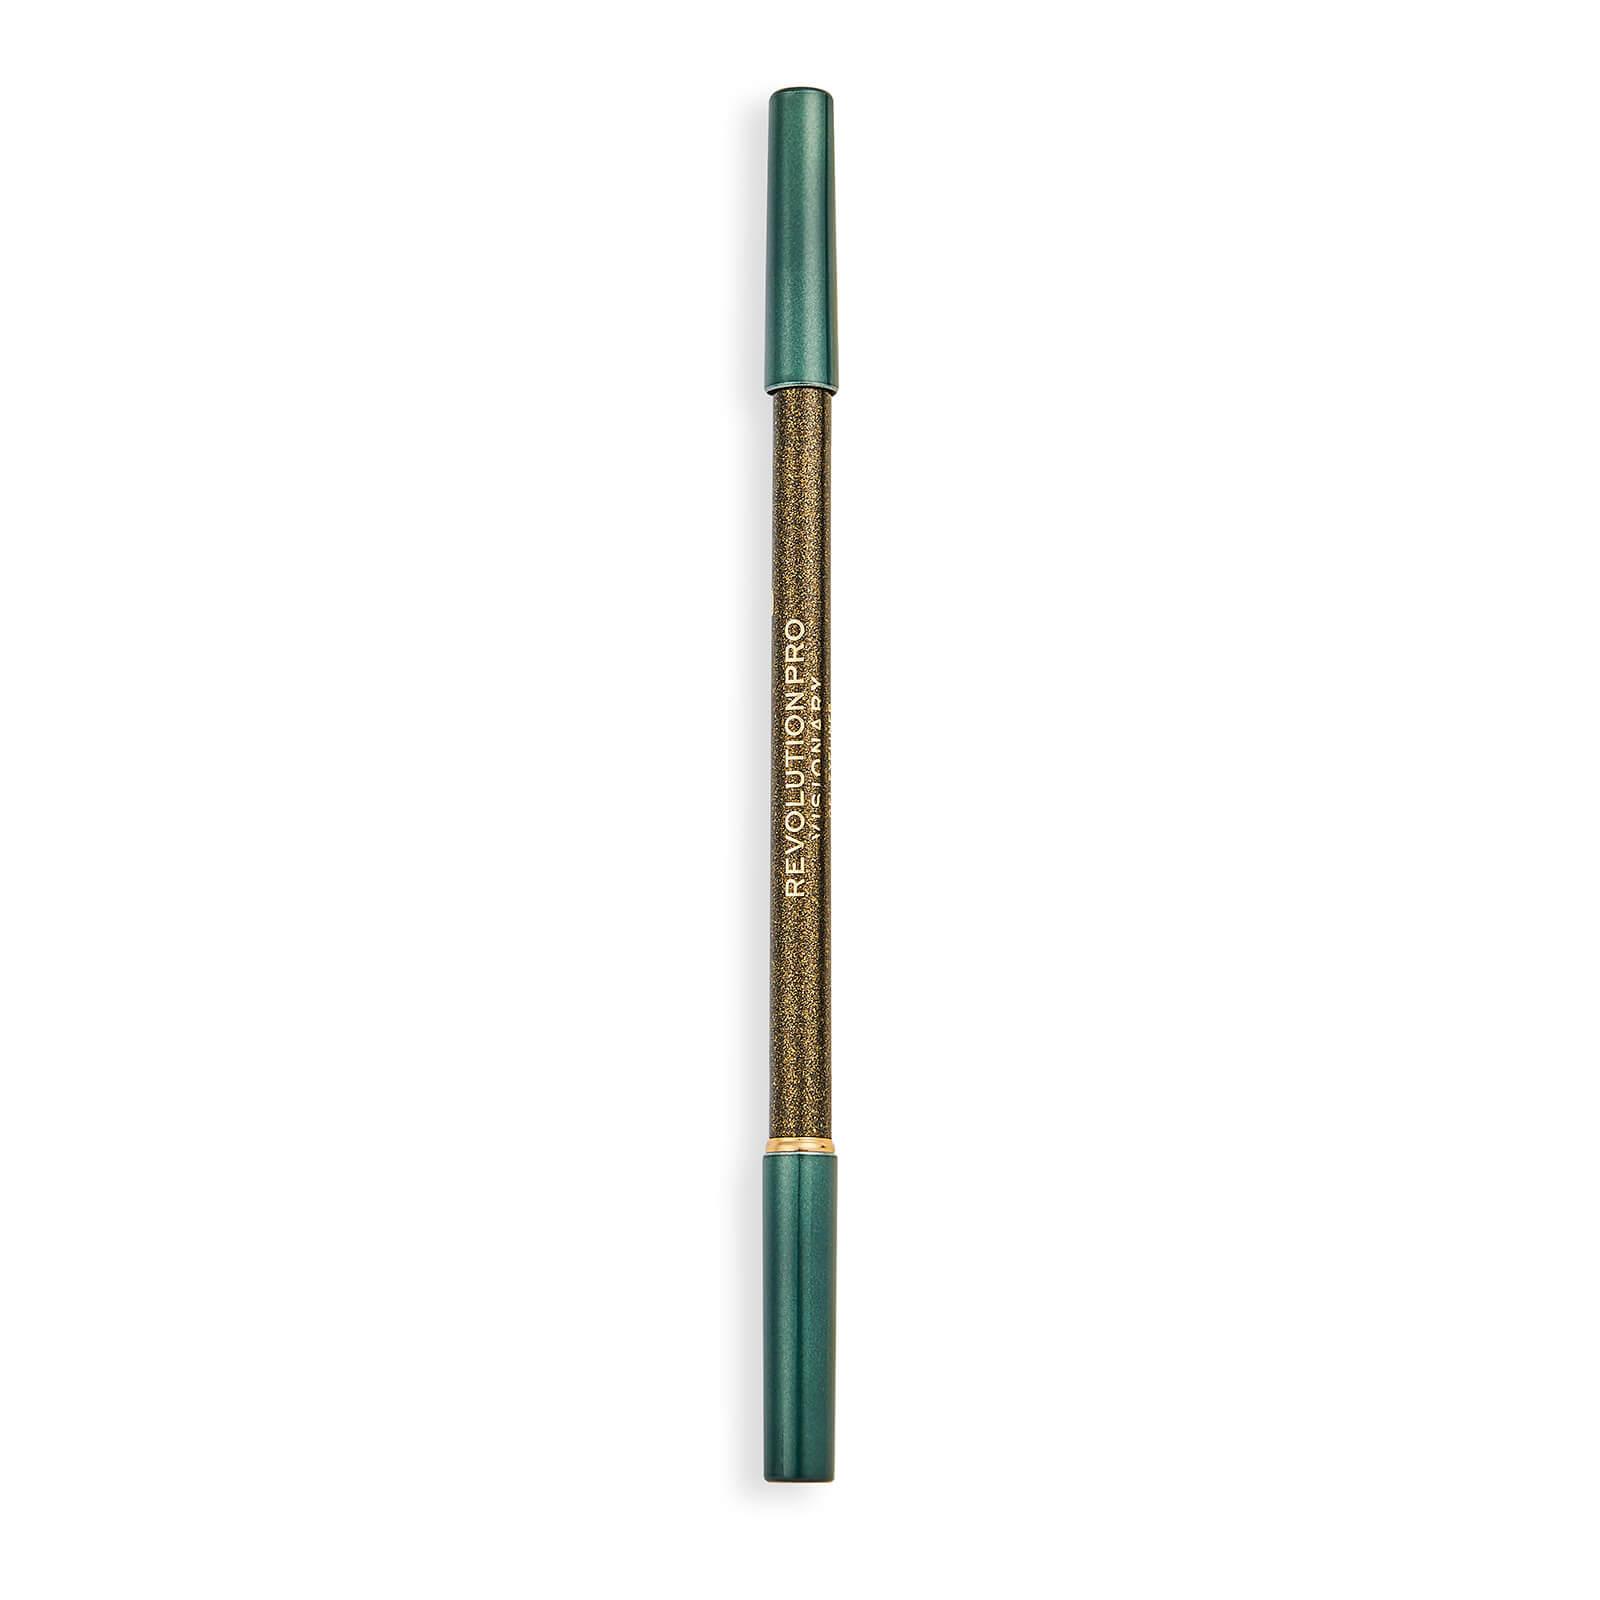 Купить Revolution Pro Visionary Gel Eyeliner Pencil Envy